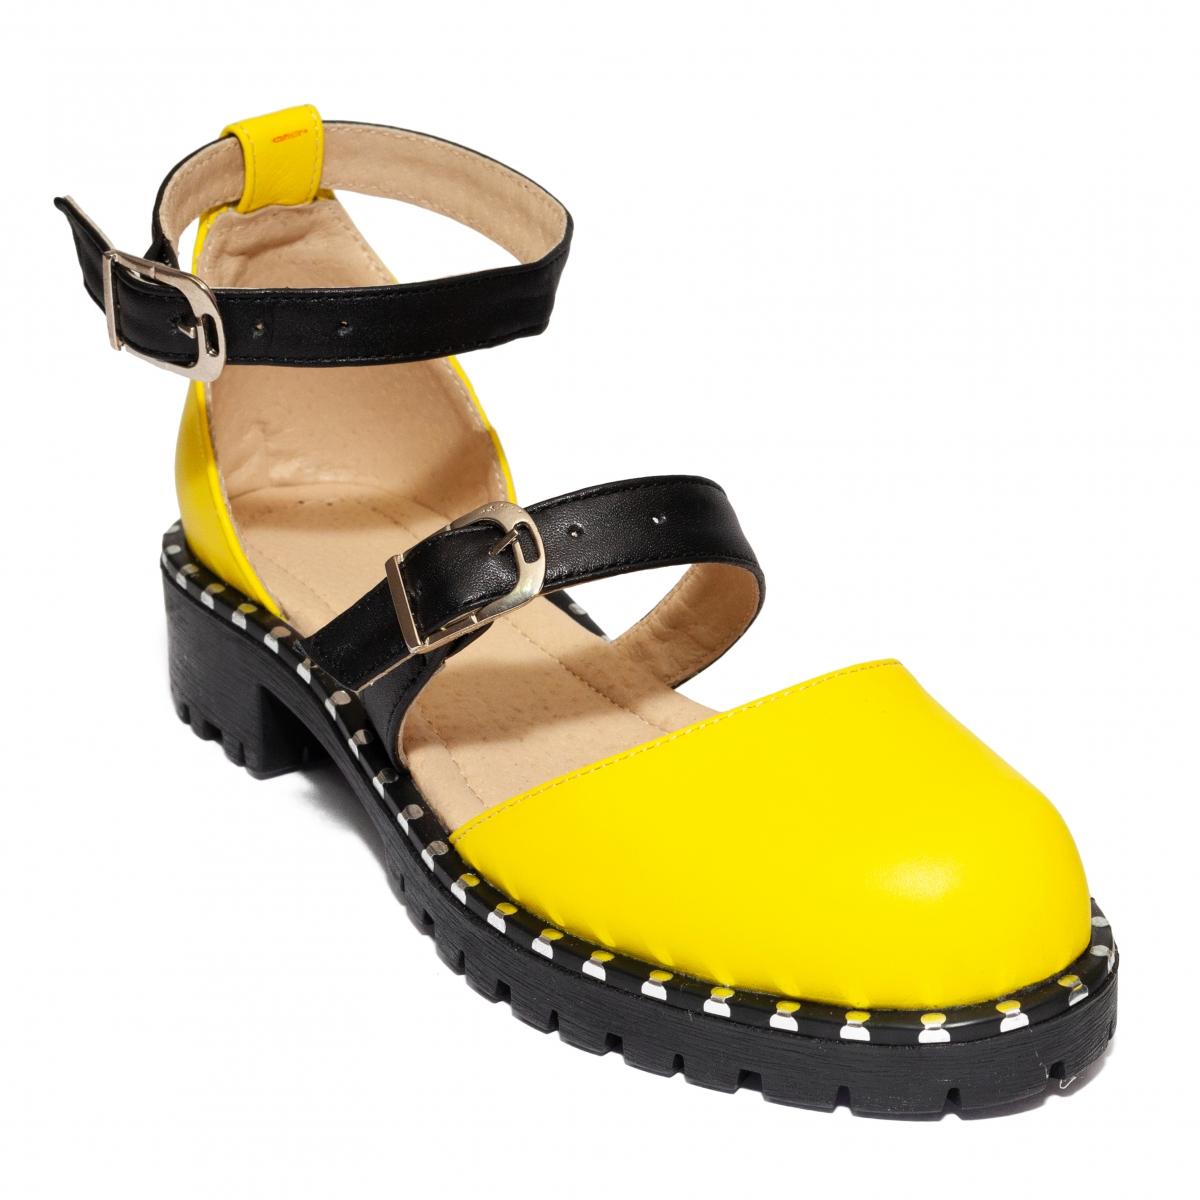 Sandale fete piele Cika new galben 36-40